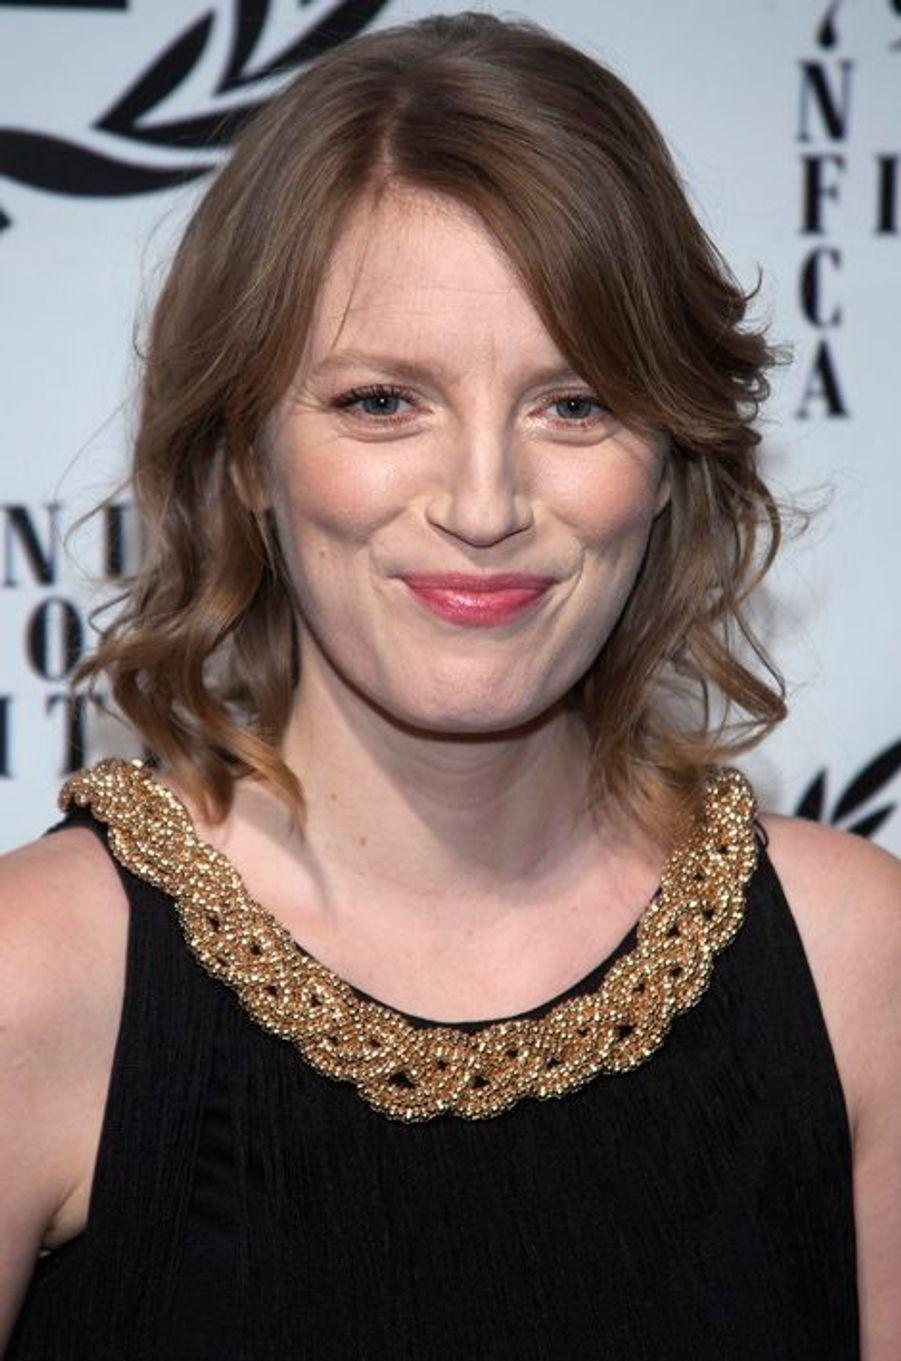 La réalisatrice Sarah Polley